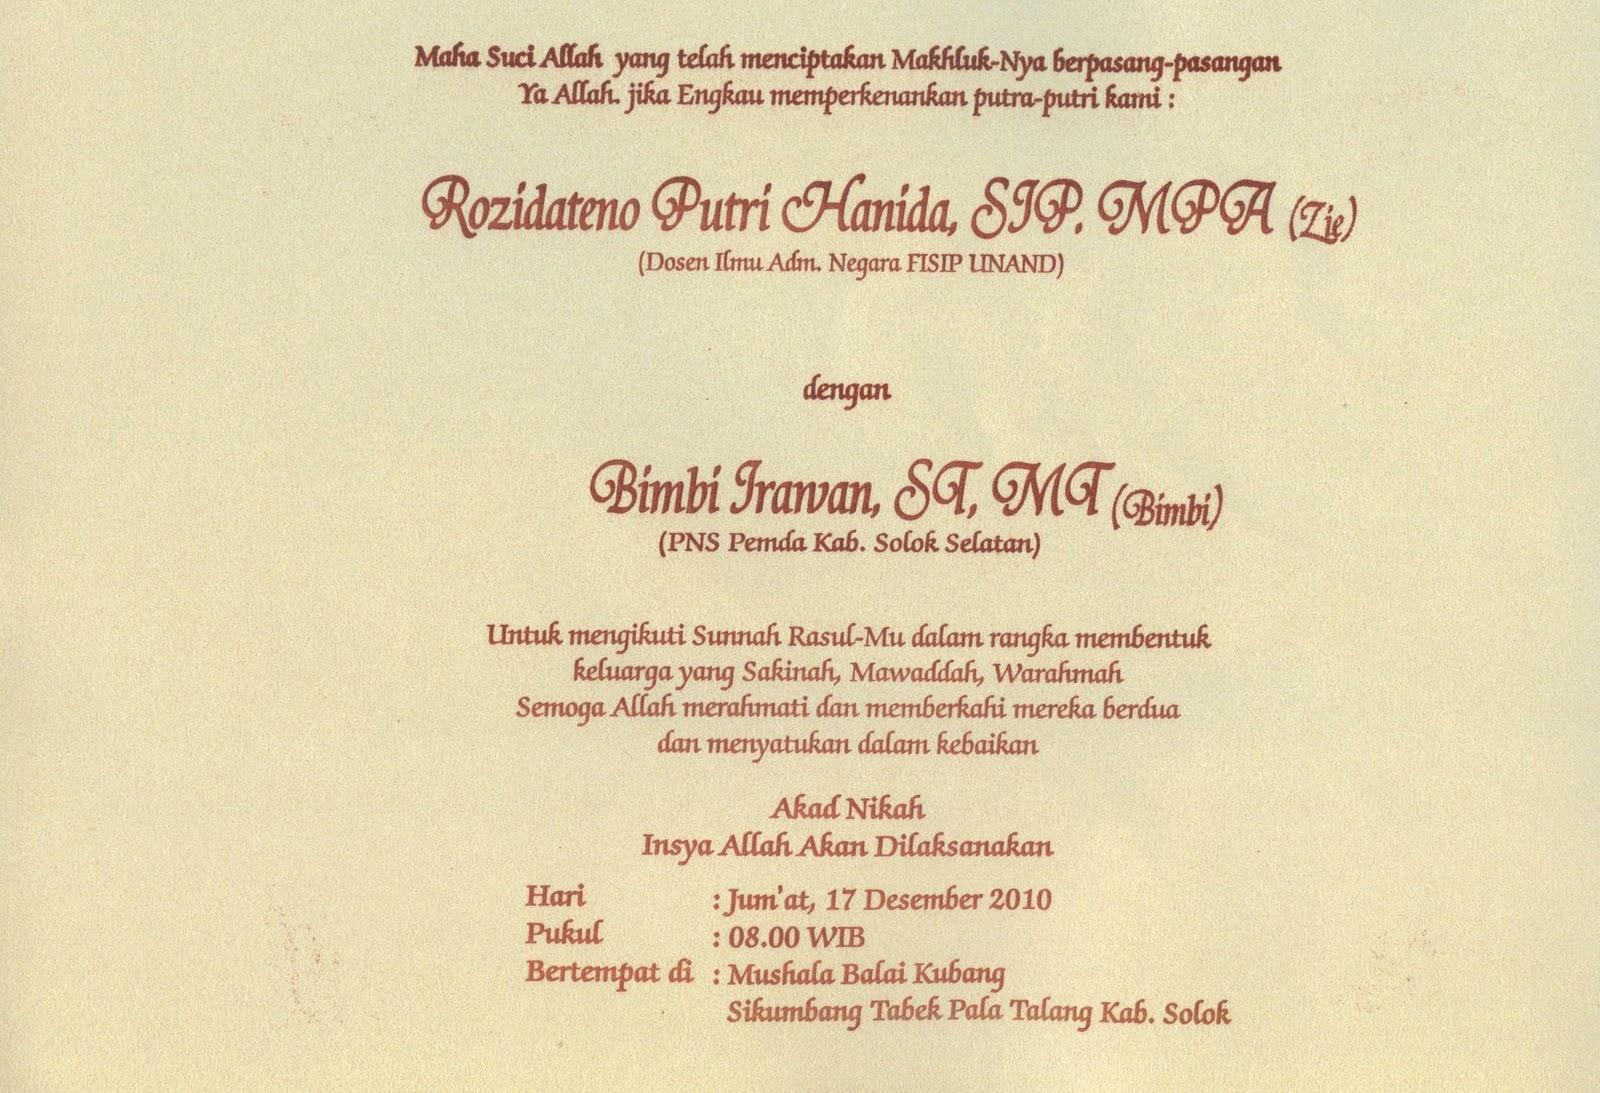 Undangan Nikah Ni Rozi Bk 1999 Asrama Mahasiswa Sumatera Barat